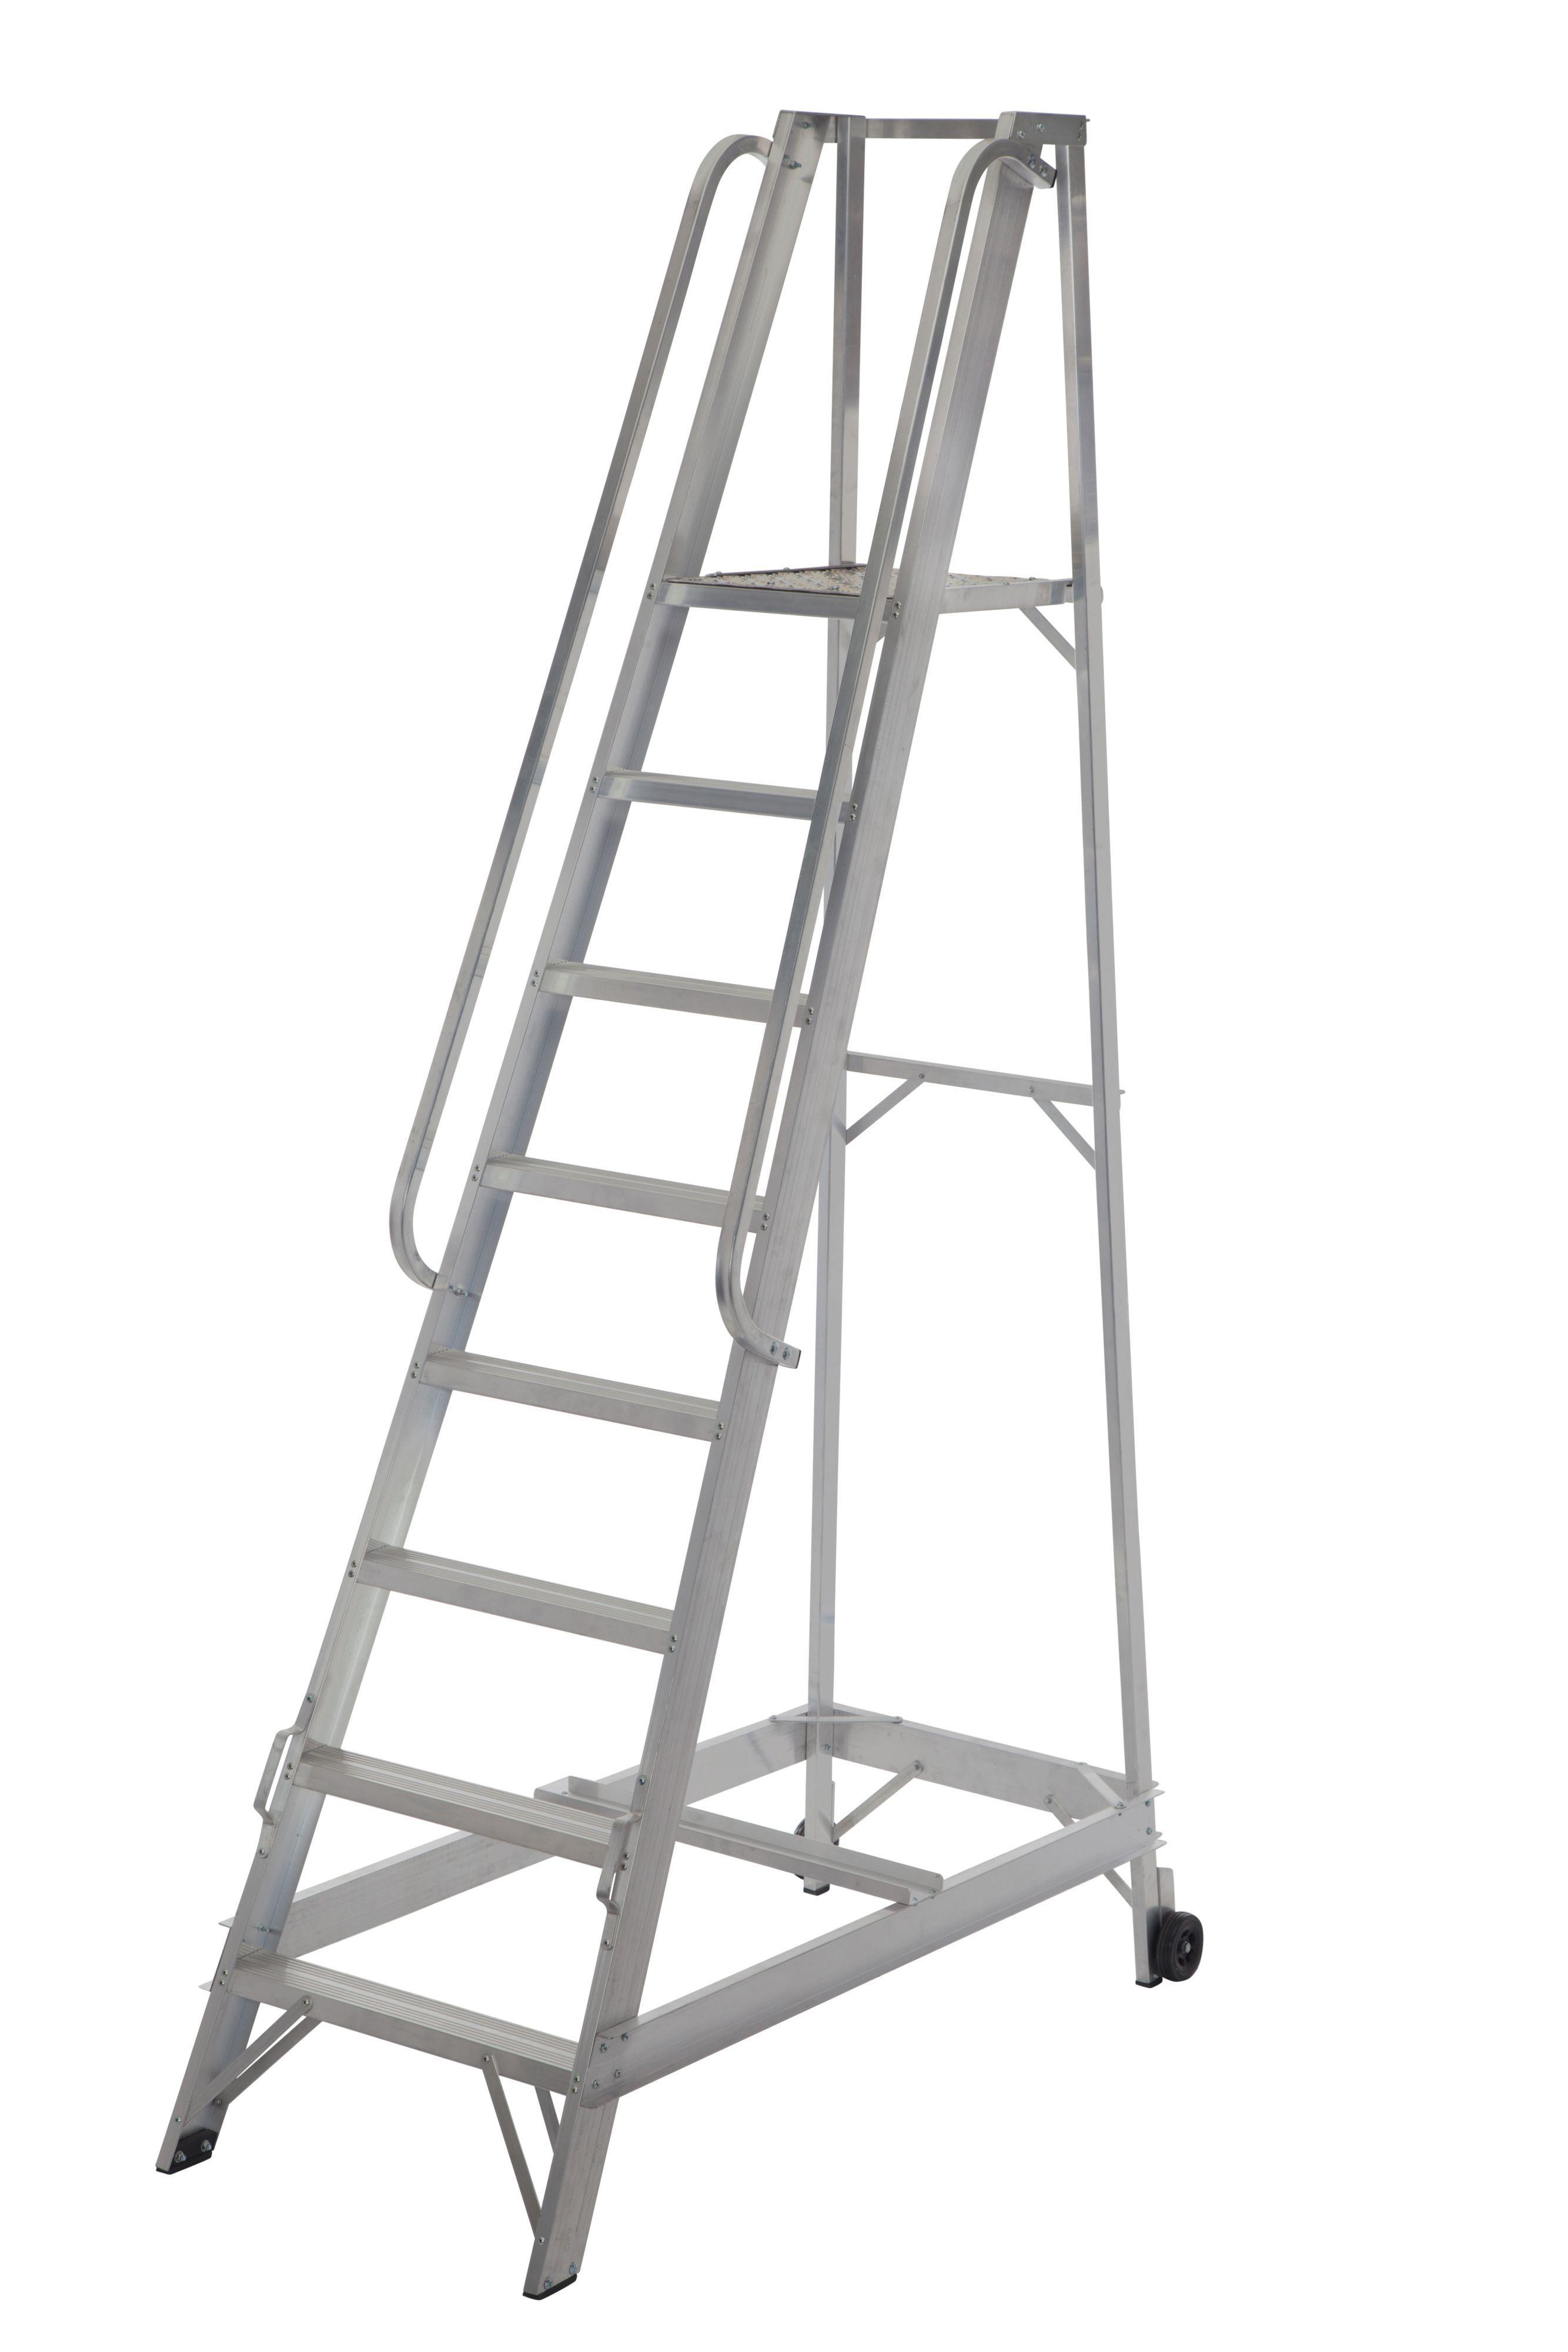 Werner 8 Tread Aluminium Platform Stepladder, 2.5 M